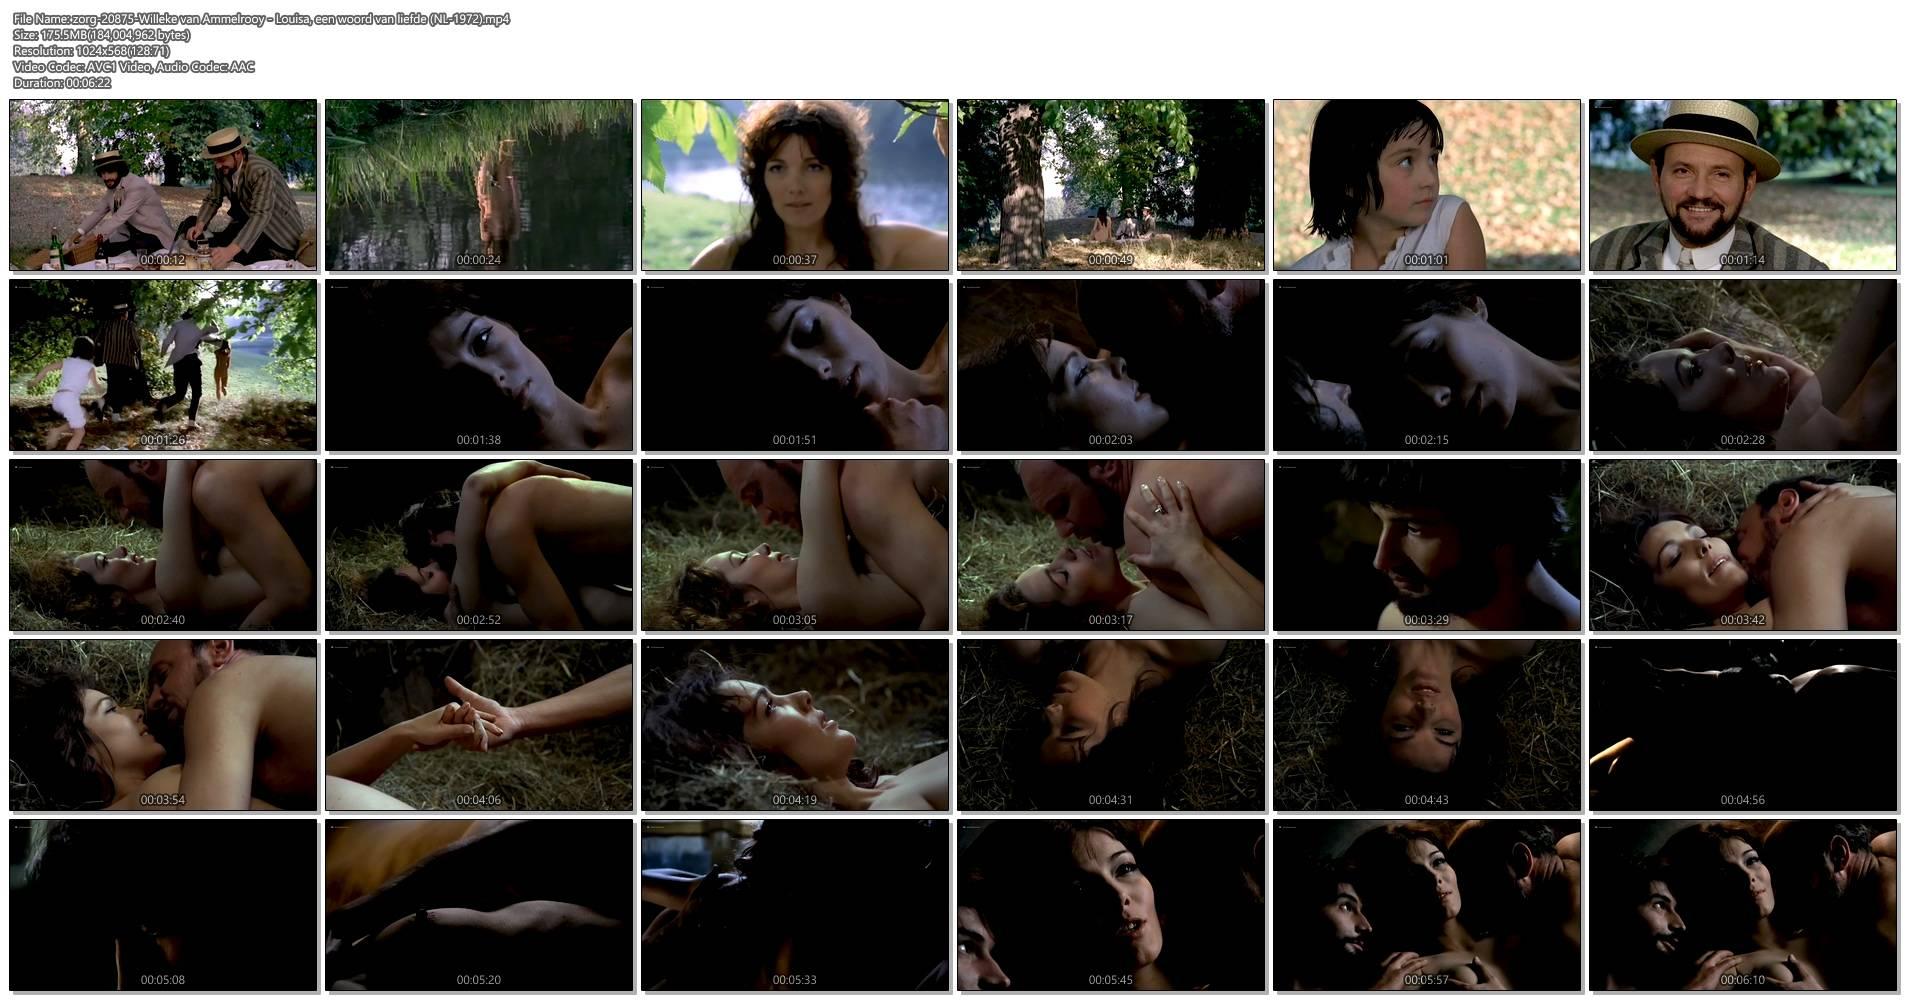 Willeke van Ammelrooy nude full frontal, butt - Louisa, een woord van liefde (NL-1972) (1)